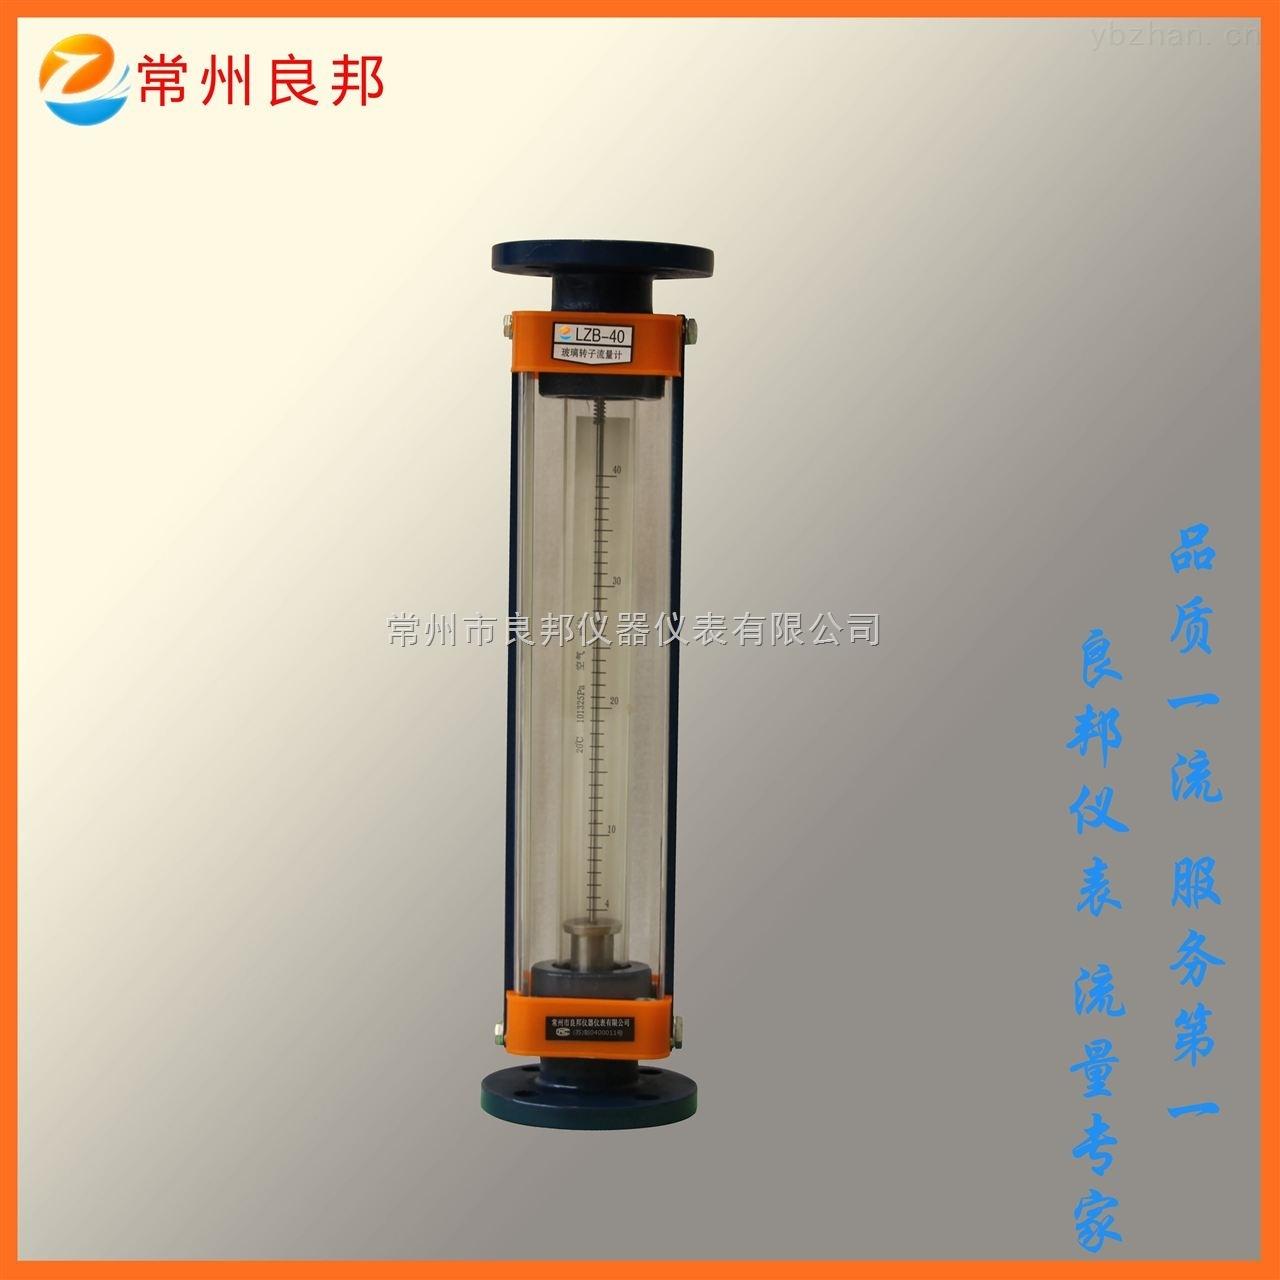 LZB-40F-LZB-40F氣體玻璃轉子流量計 CL2流量四氟防腐使用廣泛 良邦儀表非標能力強